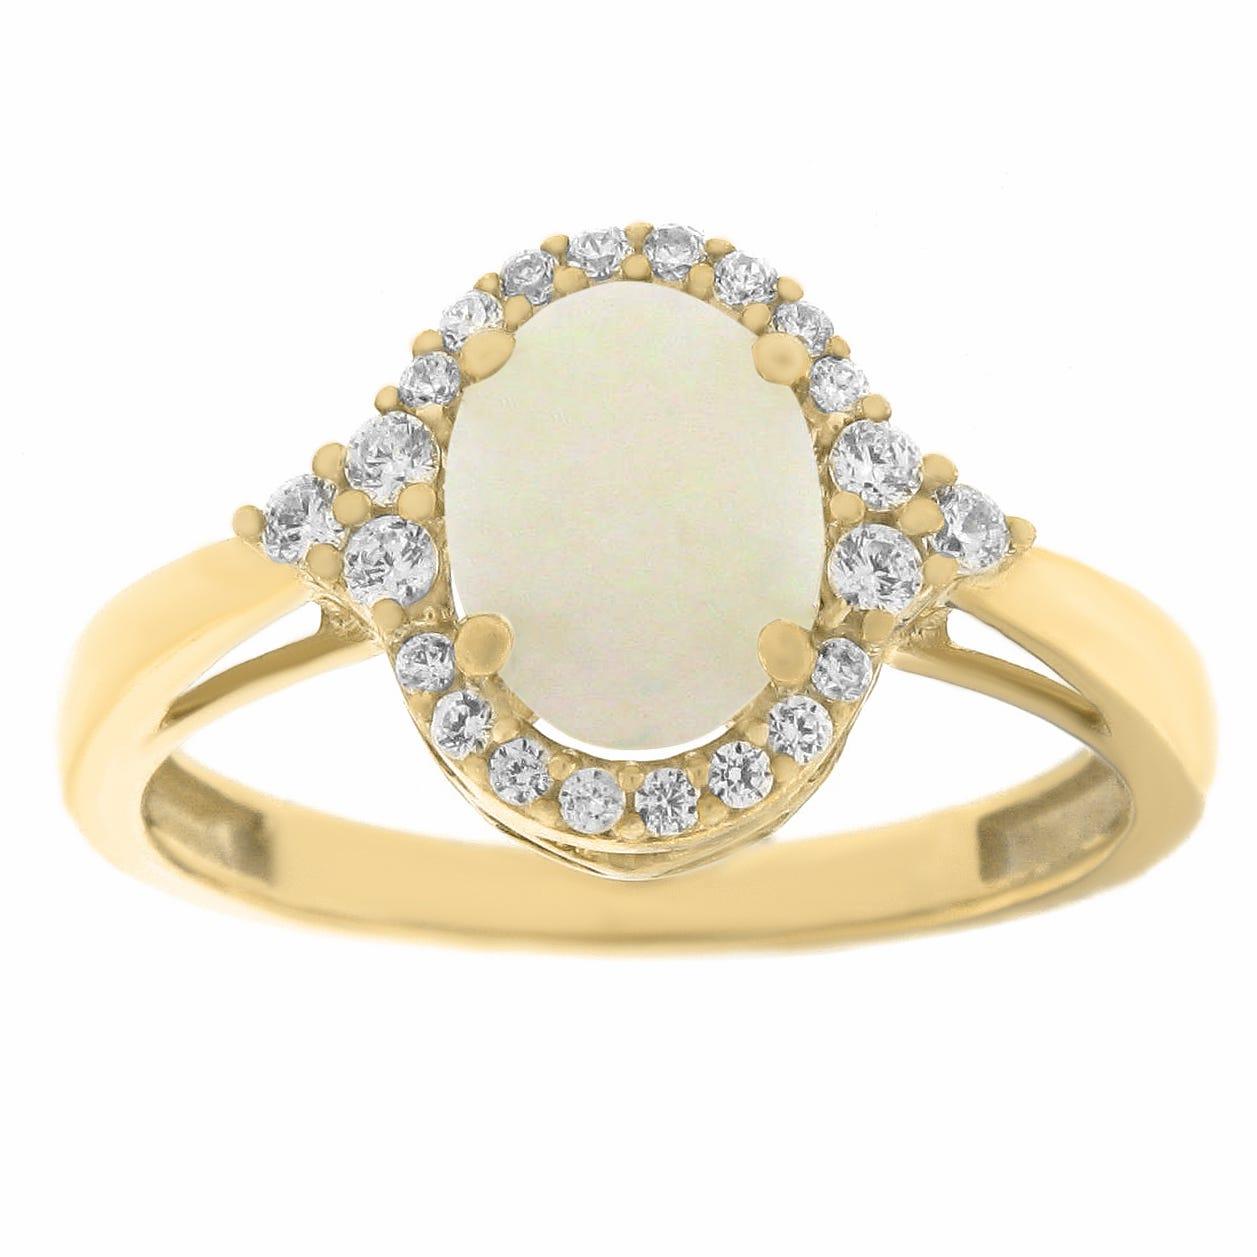 Oval Created Opal Gemstone & Diamond Halo Ring in 10k Yellow Gold